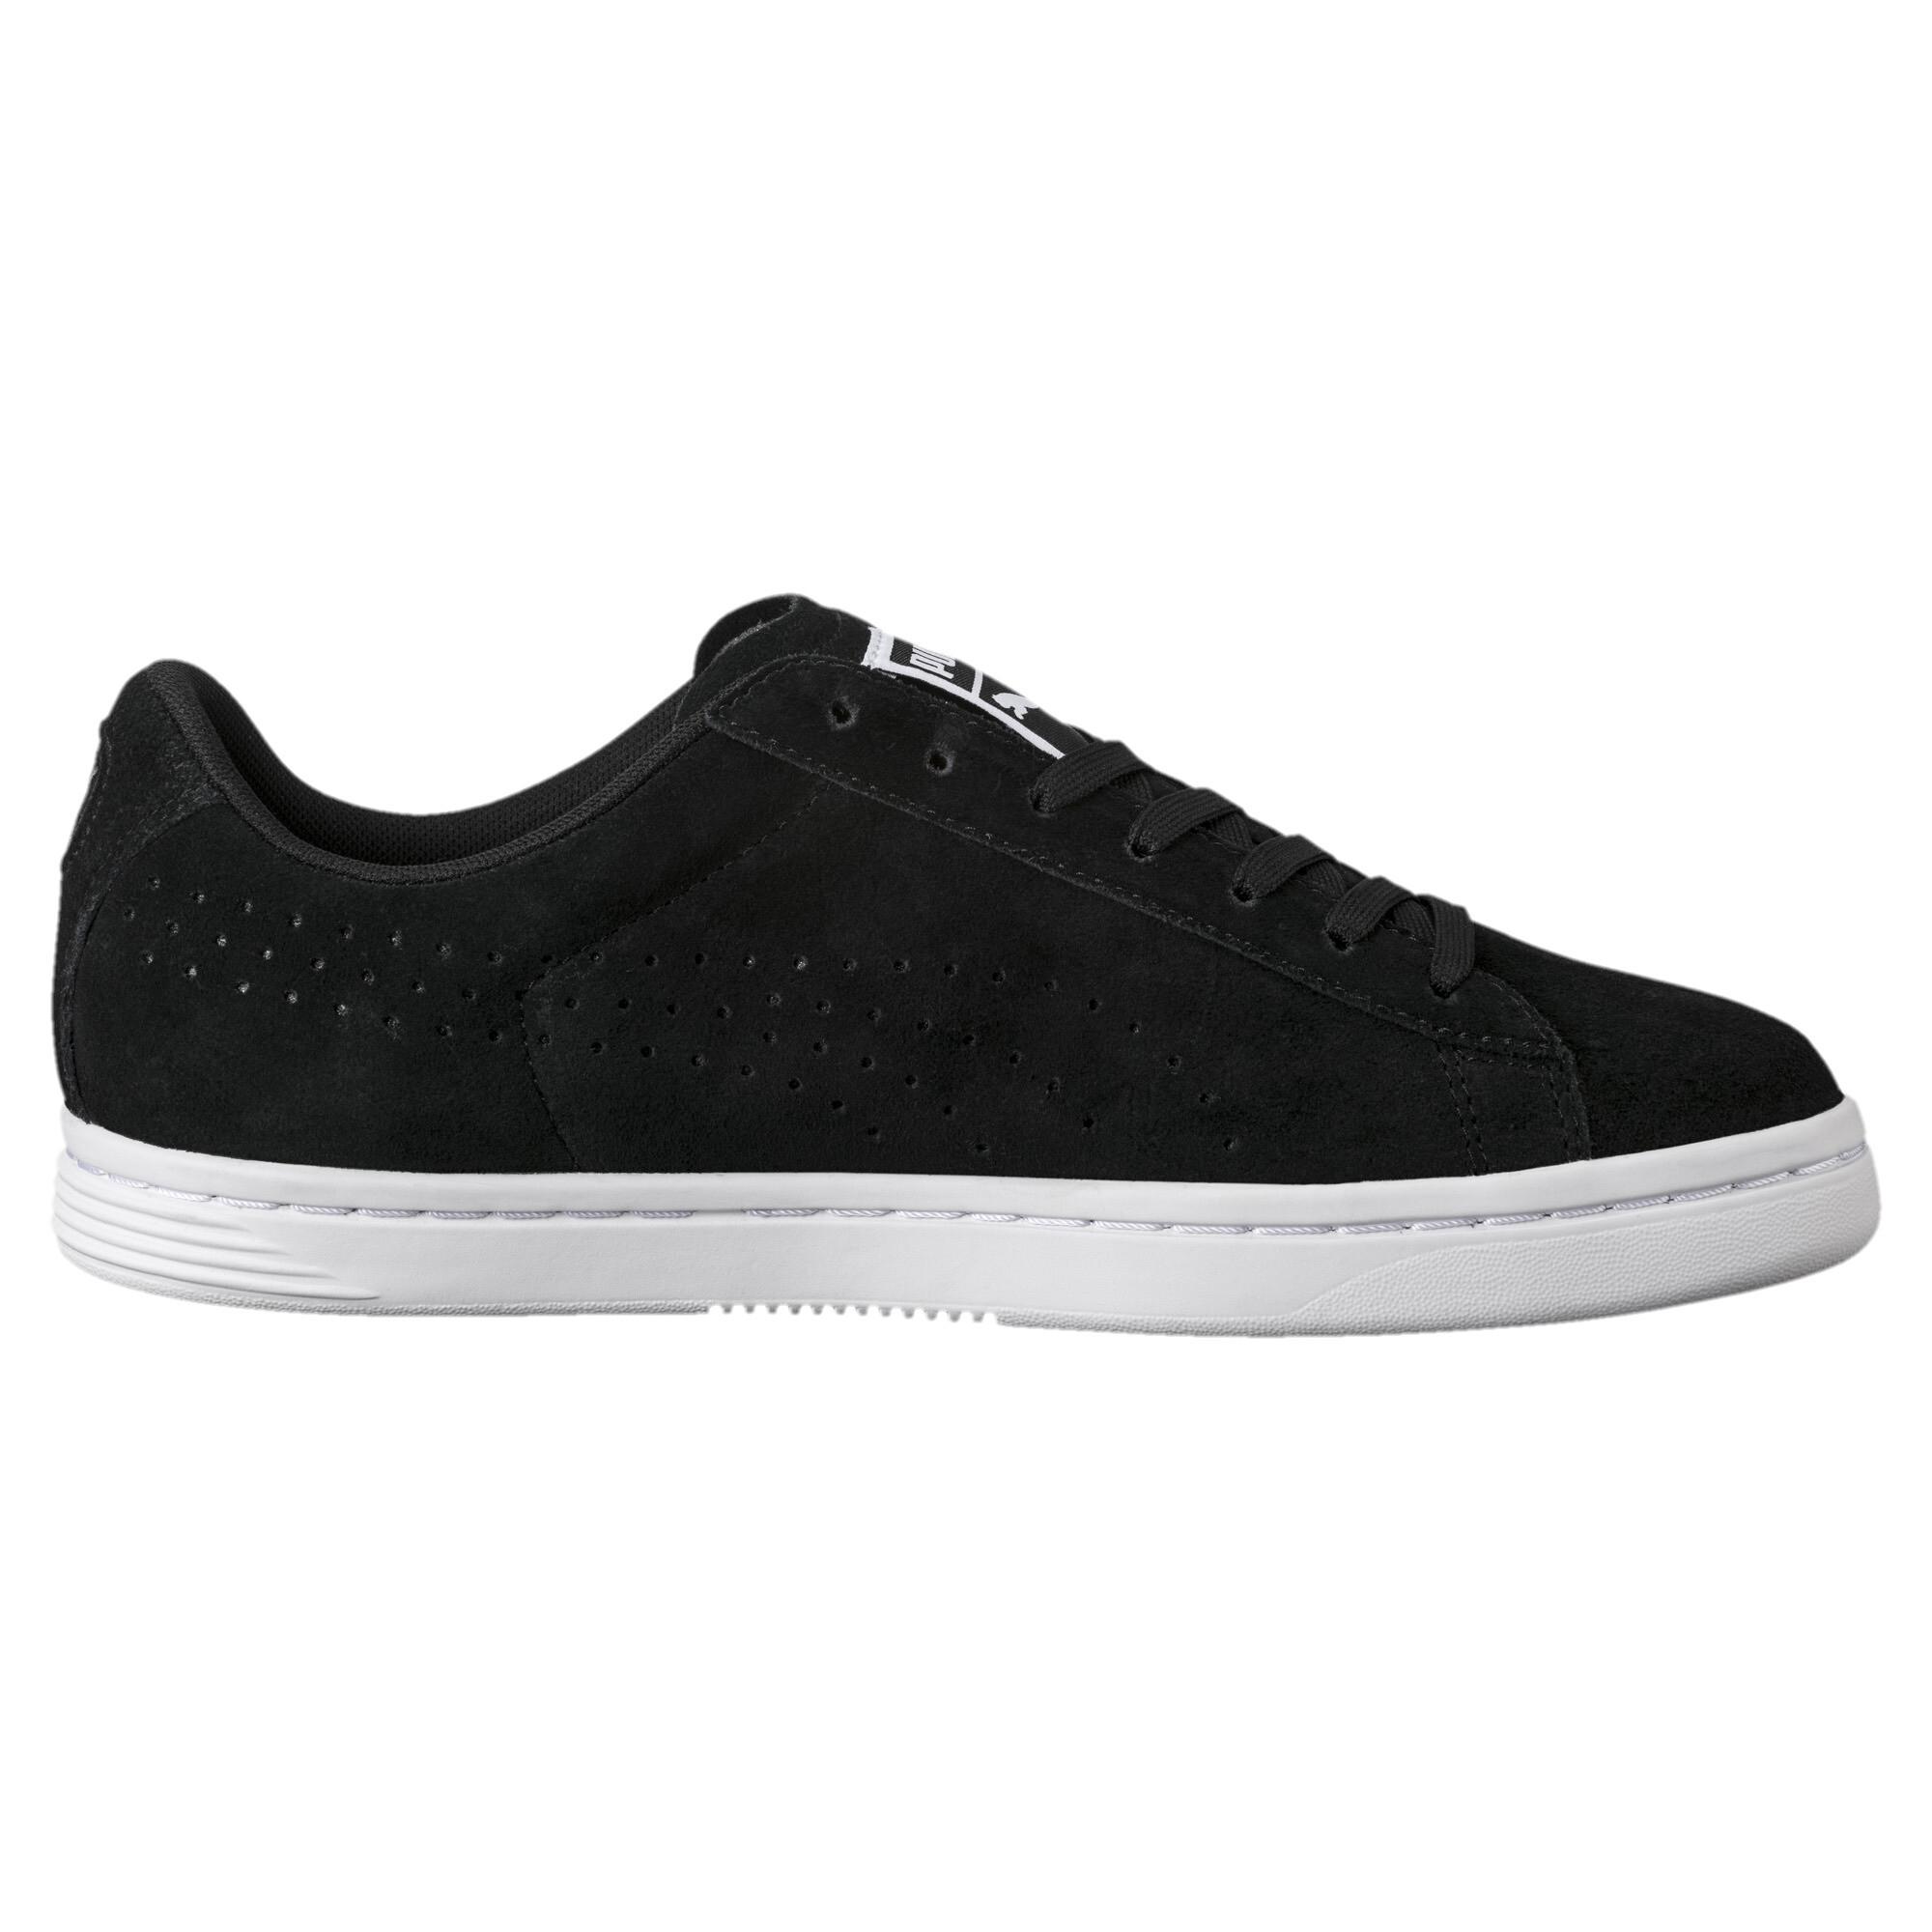 PUMA-Court-Star-Suede-Sneakers-Unisex-Shoe-Sport-Classics thumbnail 17